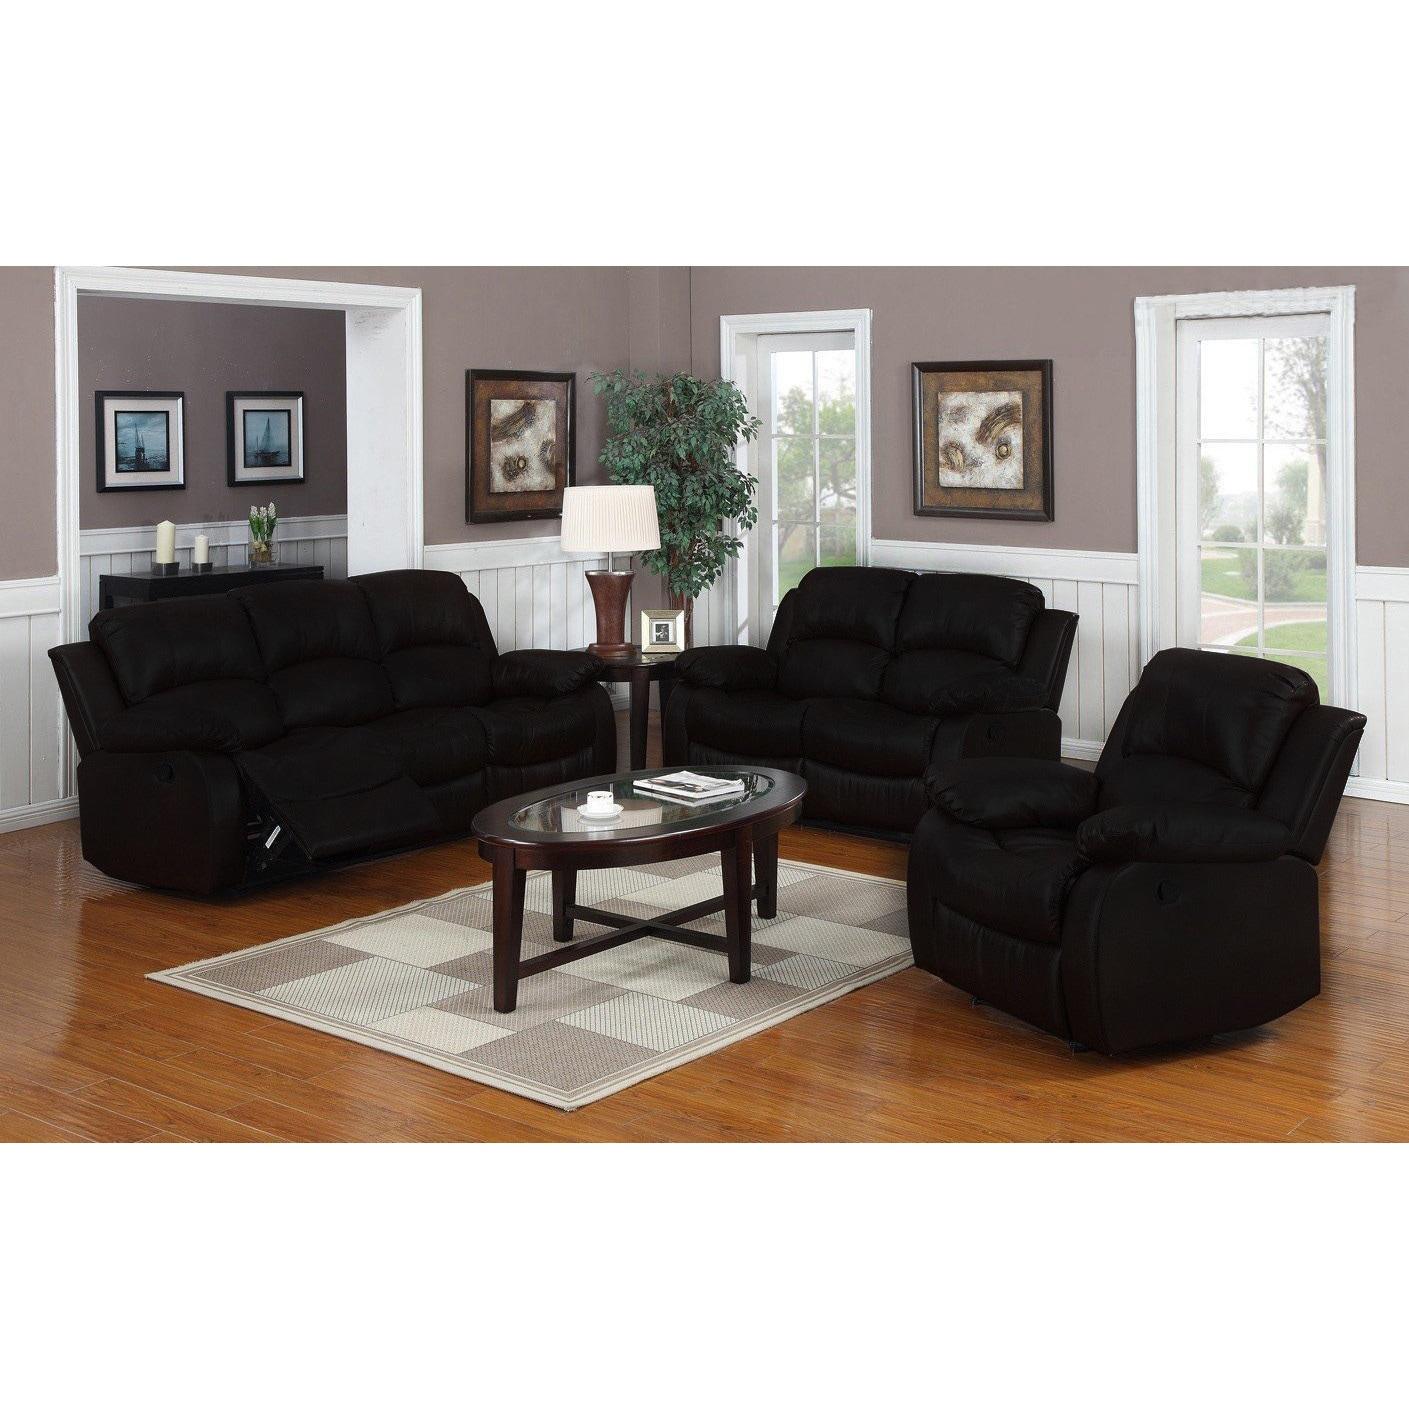 Overstuffed Real Leather Sofa Loveseat